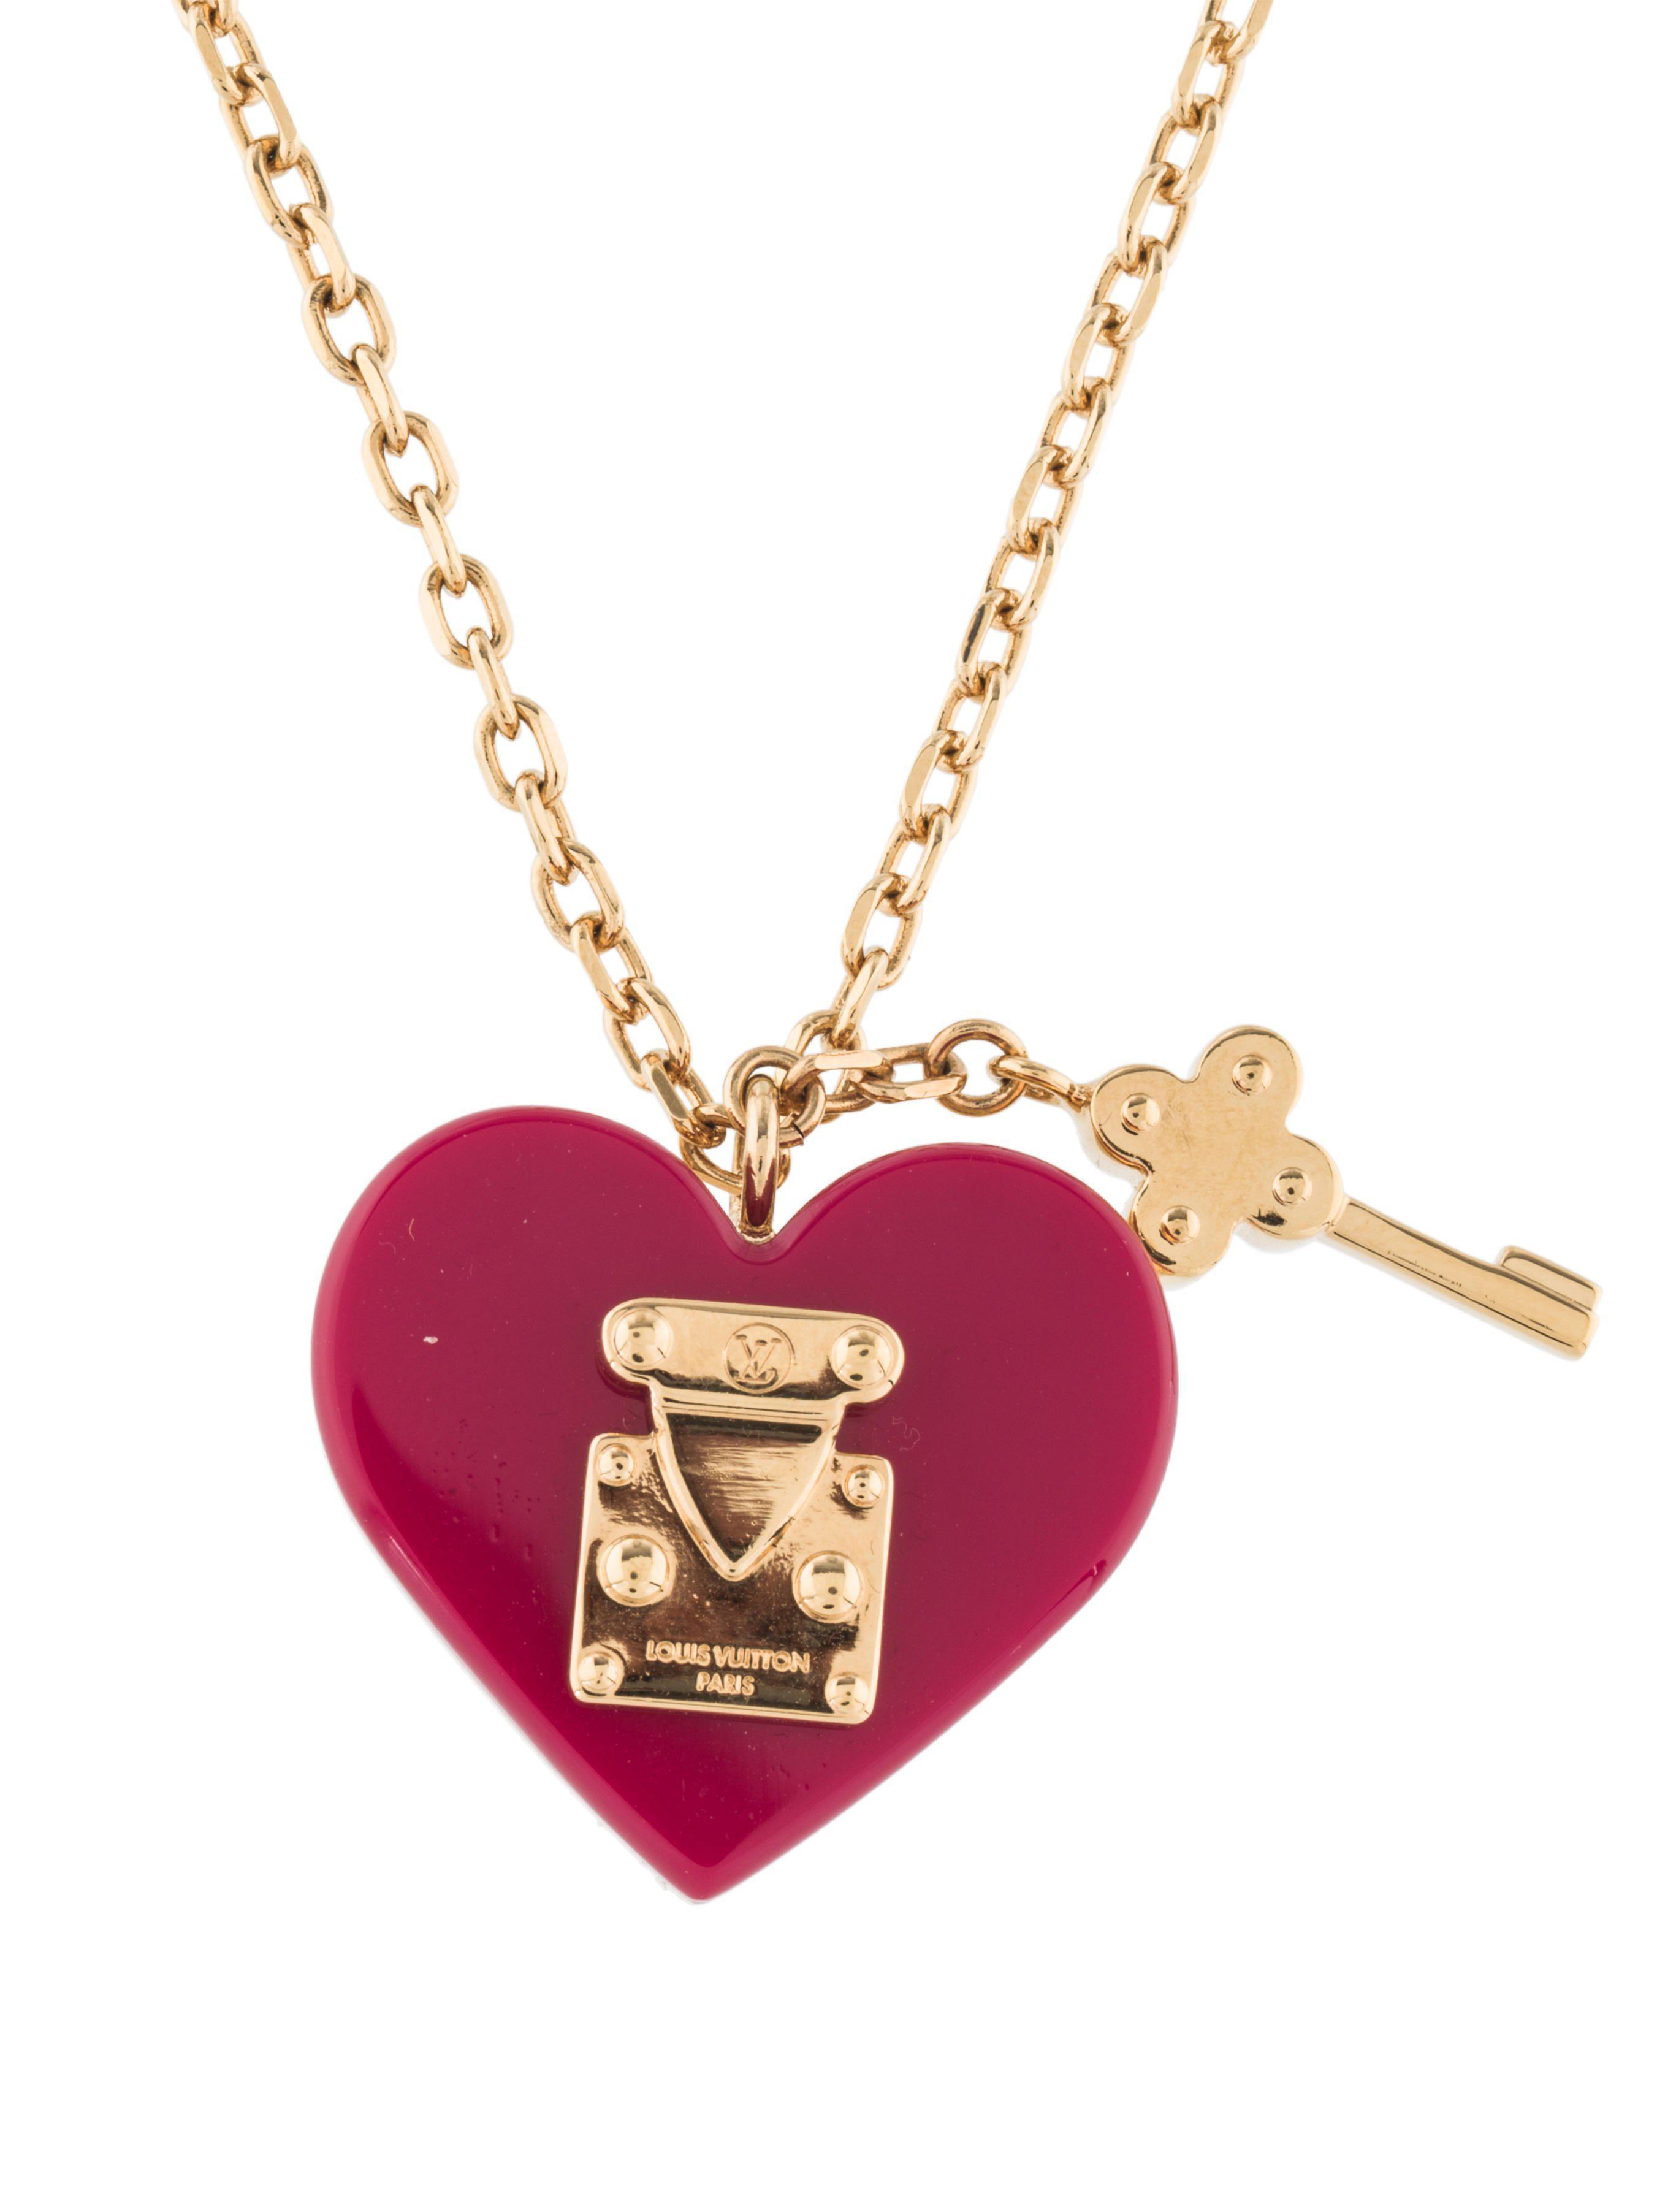 8dde6da03bfc Lyst Louis Vuitton Lock Me Pendant Necklace Gold In Metallic